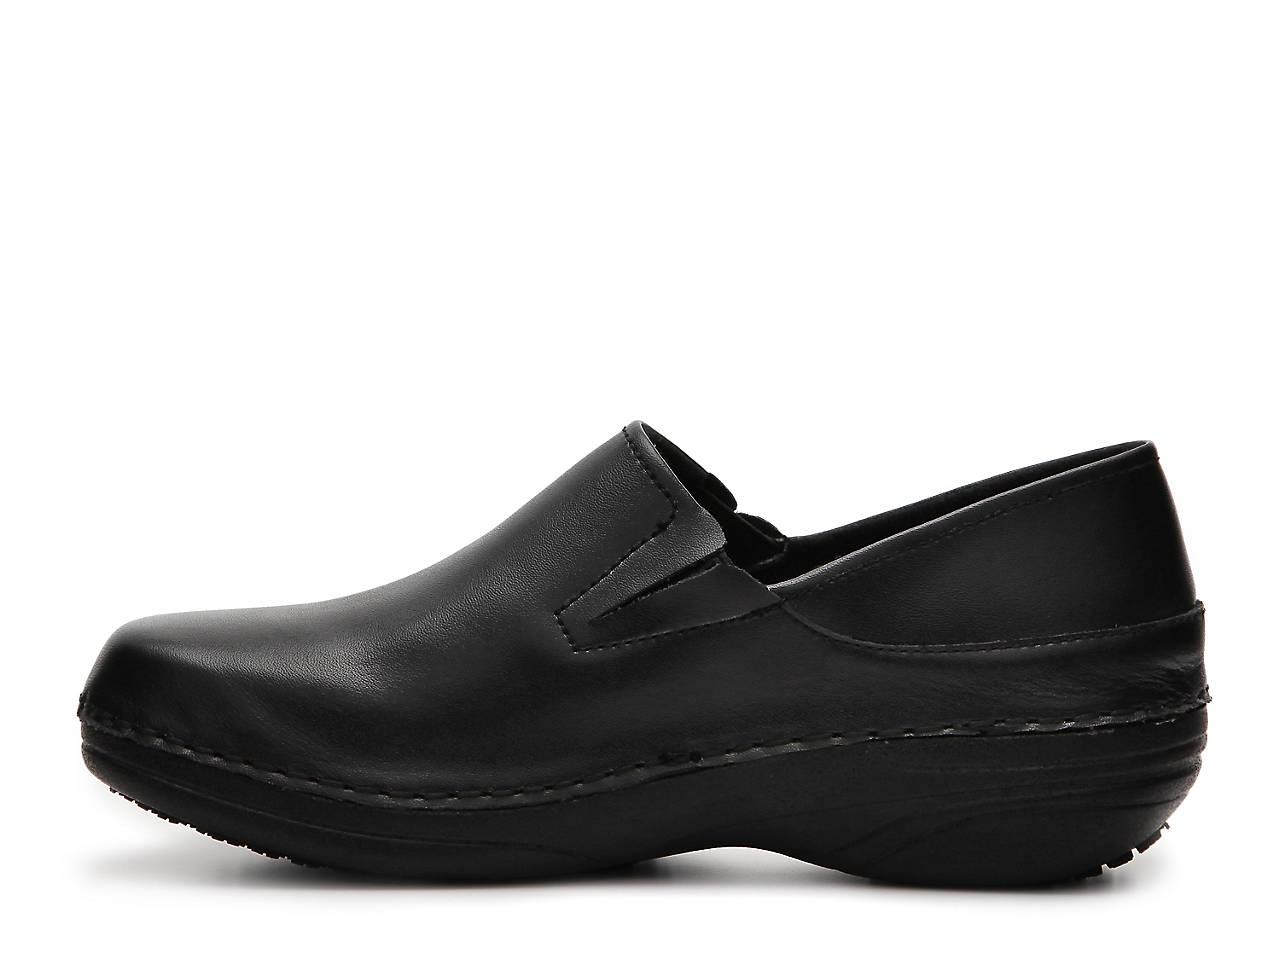 0d3d3e83dfa9a Spring Step Manila Duty Work Slip-On Women s Shoes